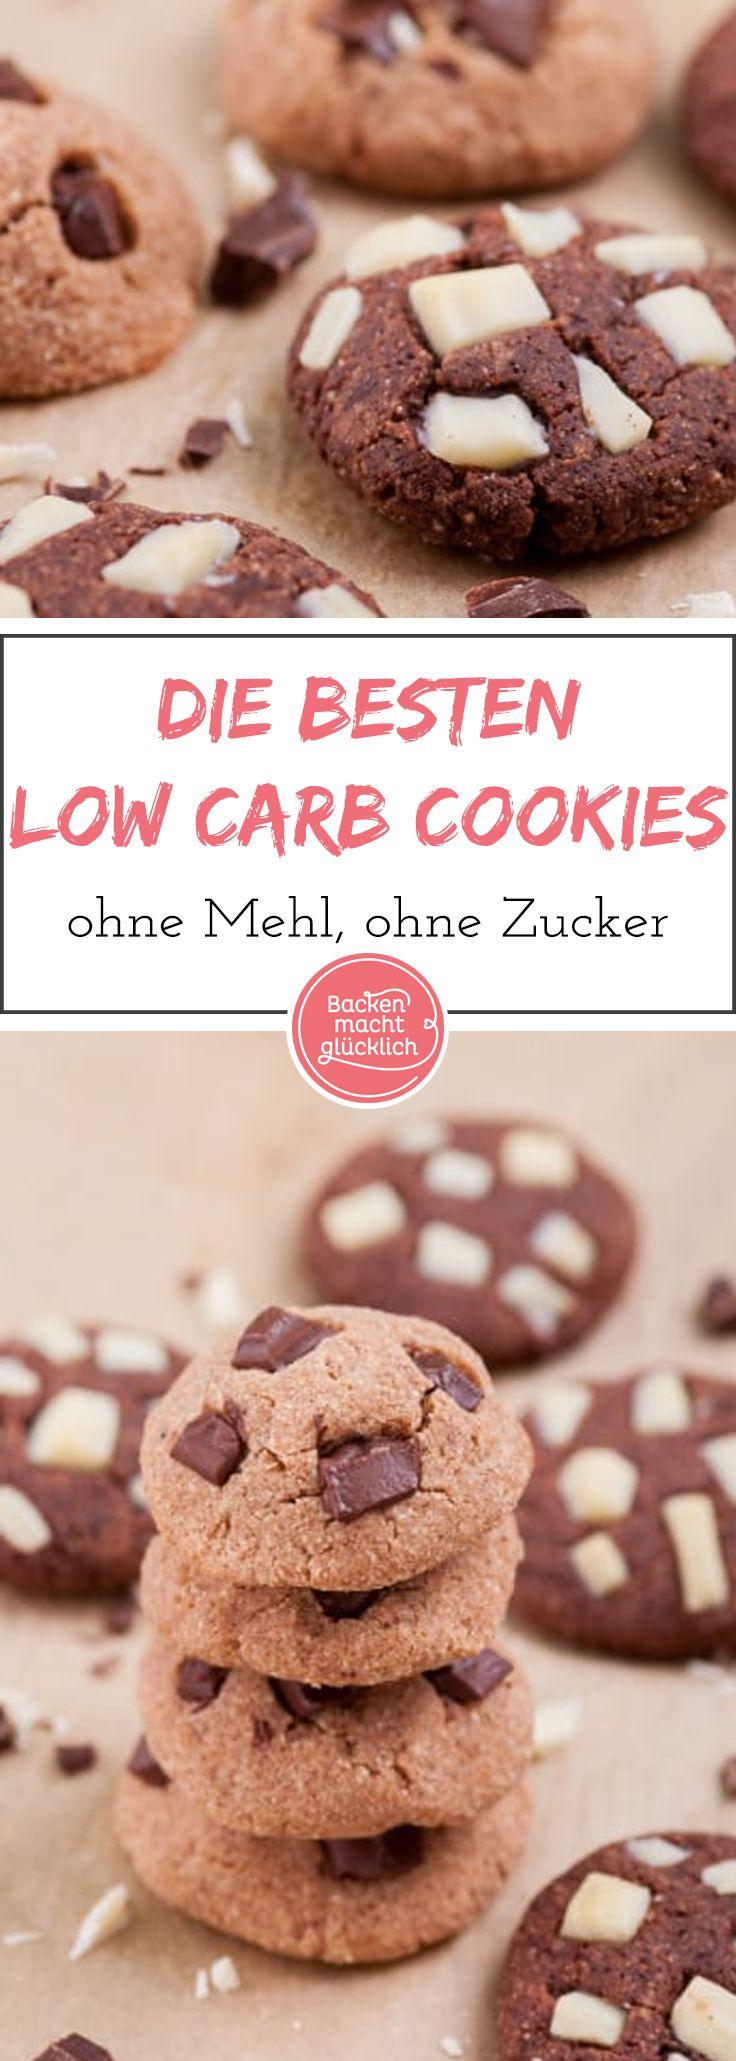 low carb chocolate cookies rezept backen mit schokolade rezepte pinterest low carb low. Black Bedroom Furniture Sets. Home Design Ideas